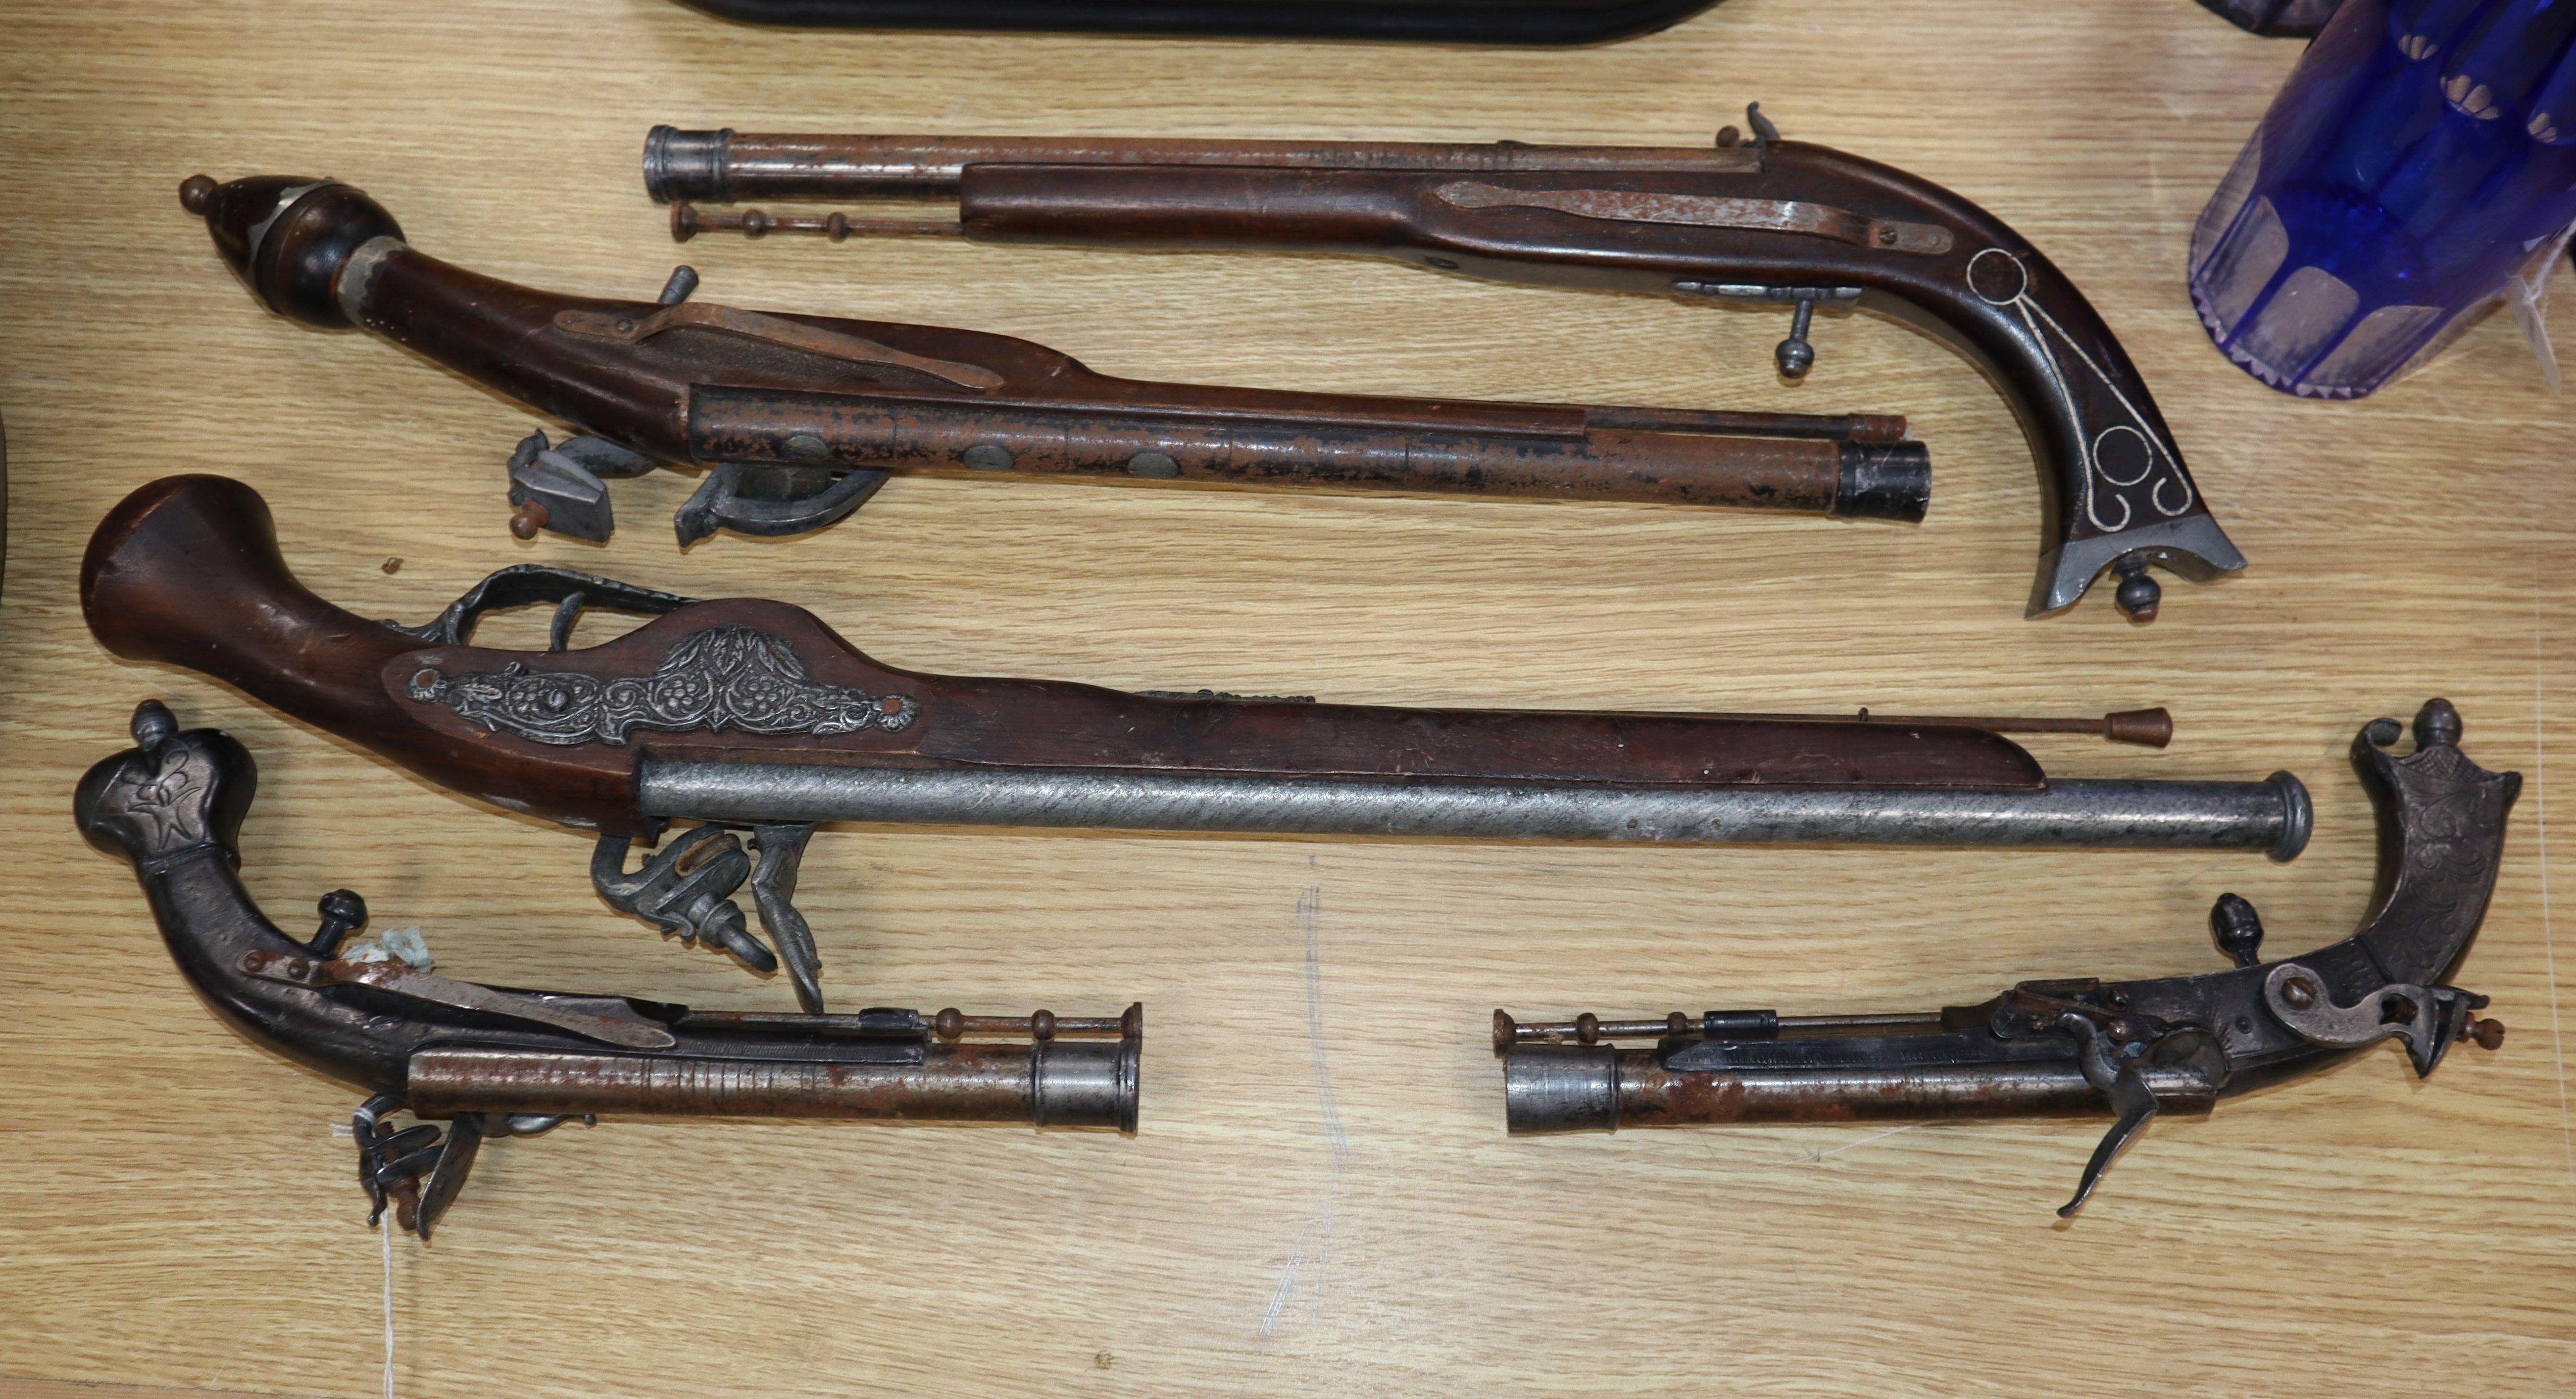 Lot 155 - Five theatrical pistols